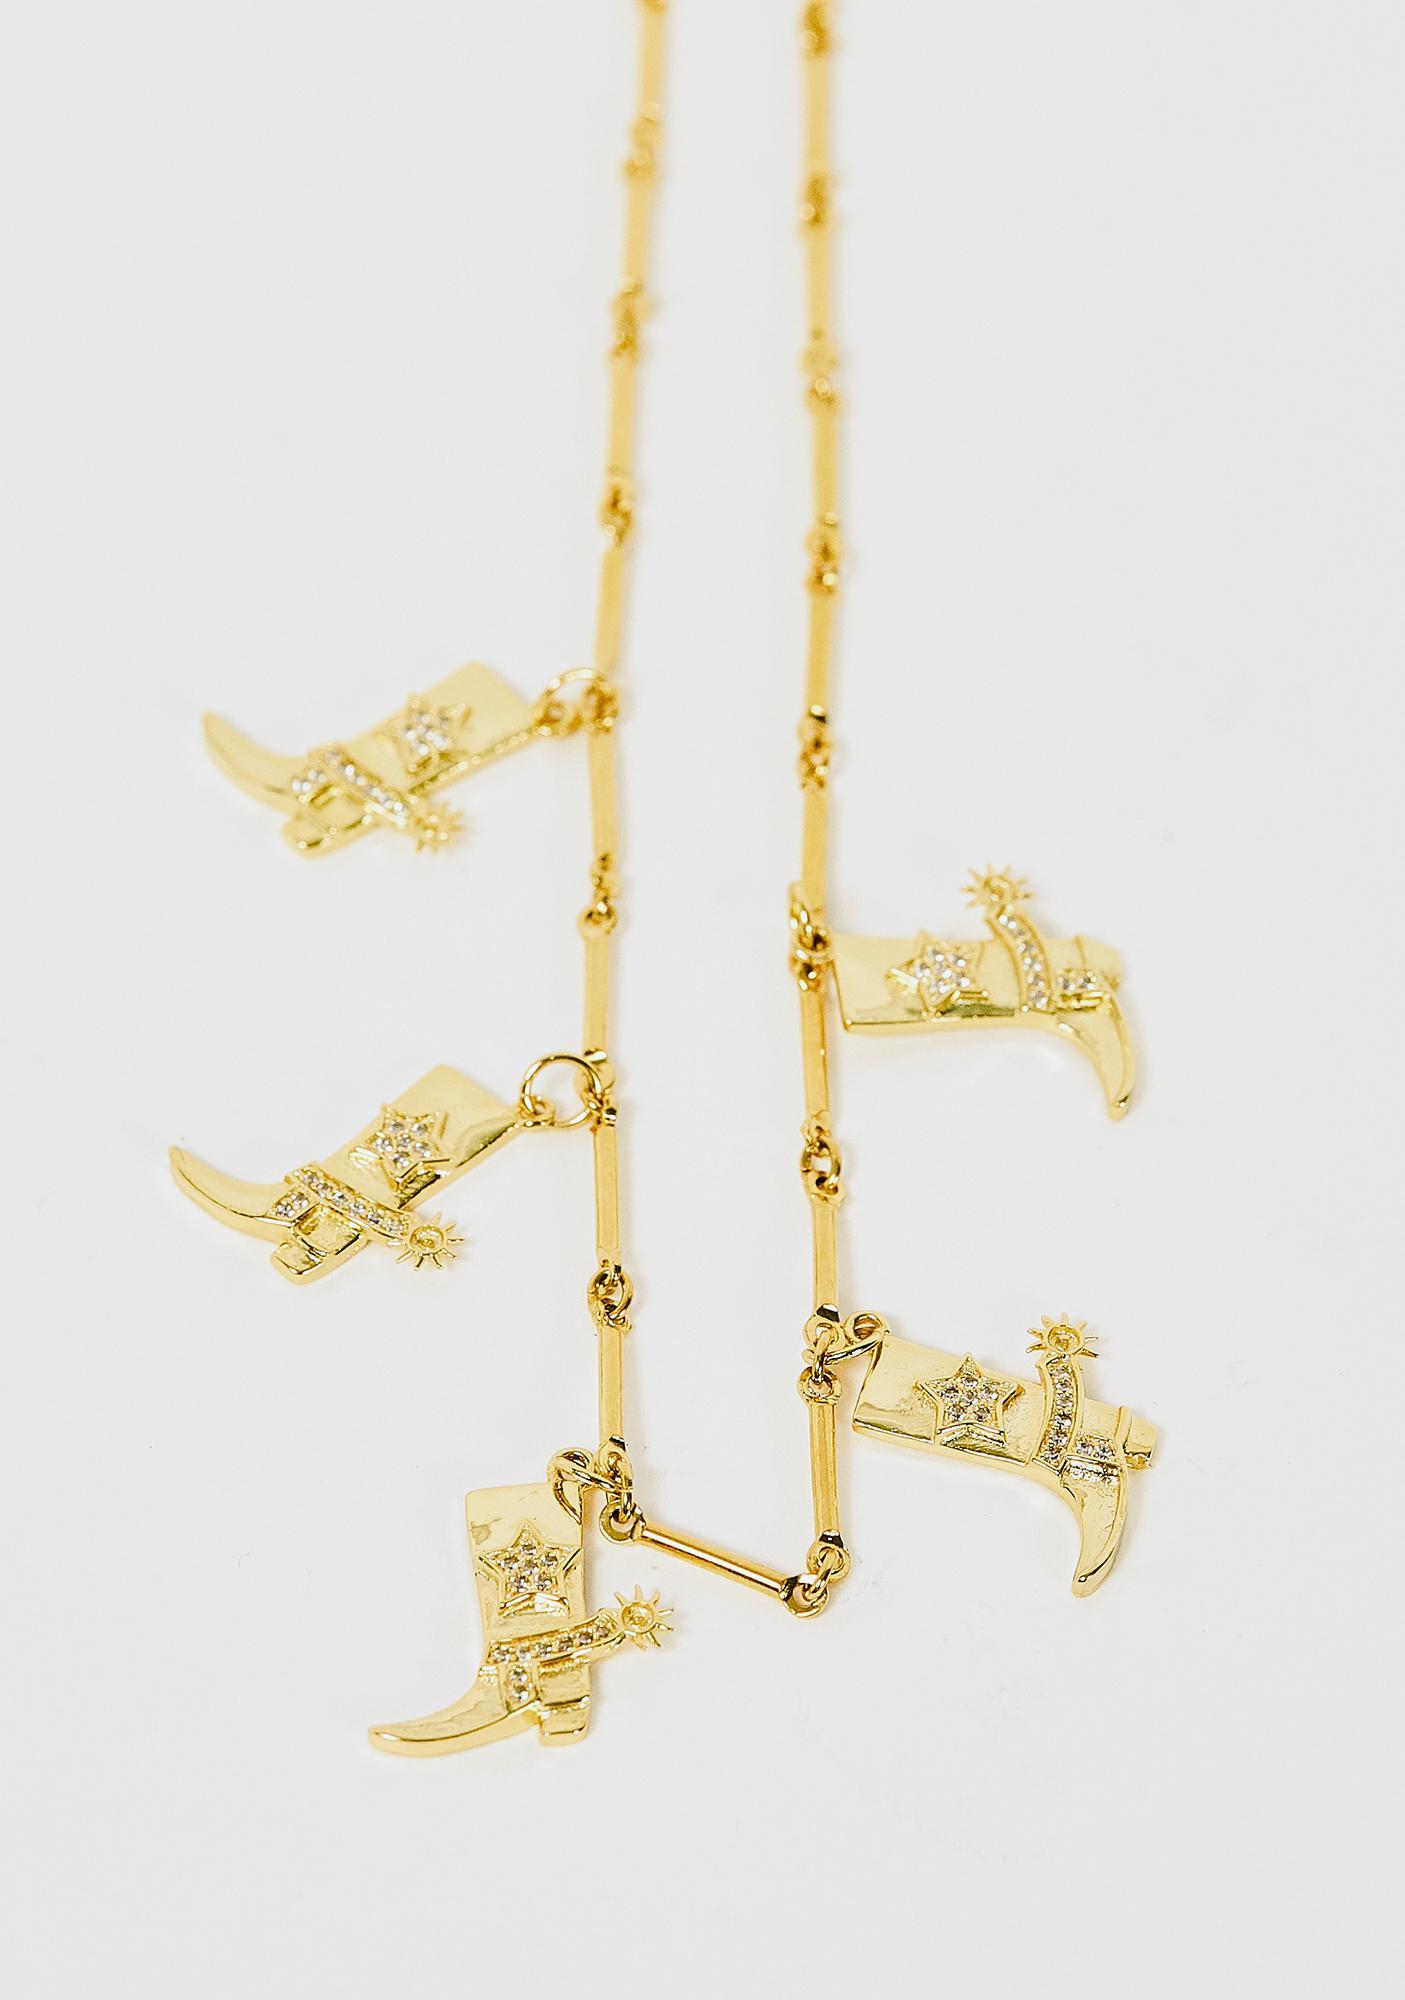 Desert Moon Gold Cowboy Boots Charm Necklace